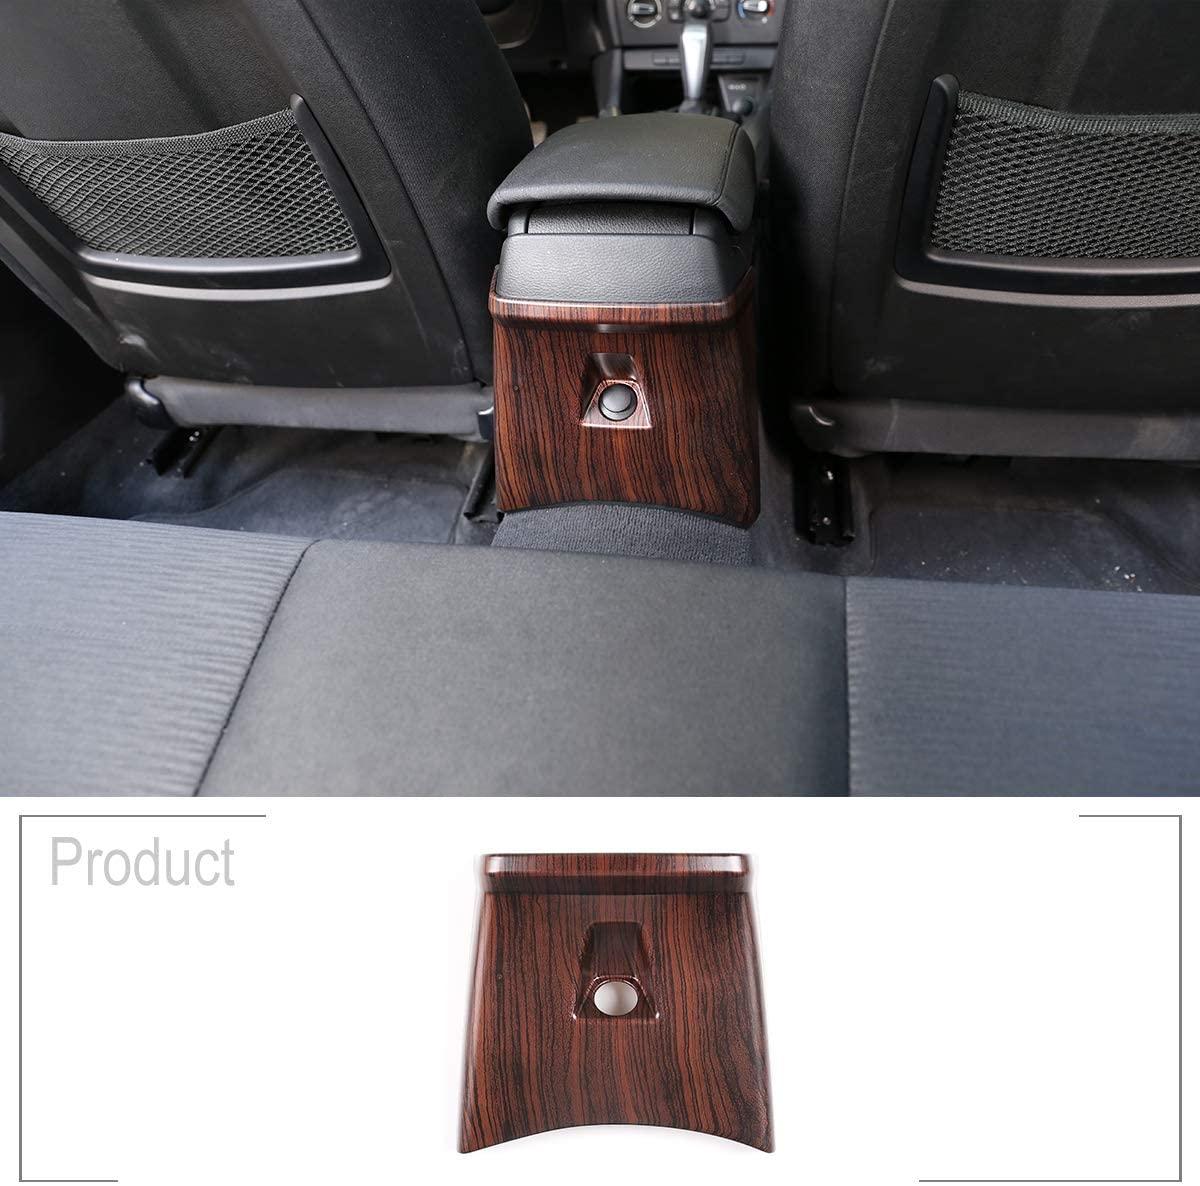 TongSheng Pine Wood Grain and Back Wood Grain for BMW X1 E84 2010-2015 ABS Car Rear Row Air Vent Panel Cover Trim Accessories (Pine Wood Grain)